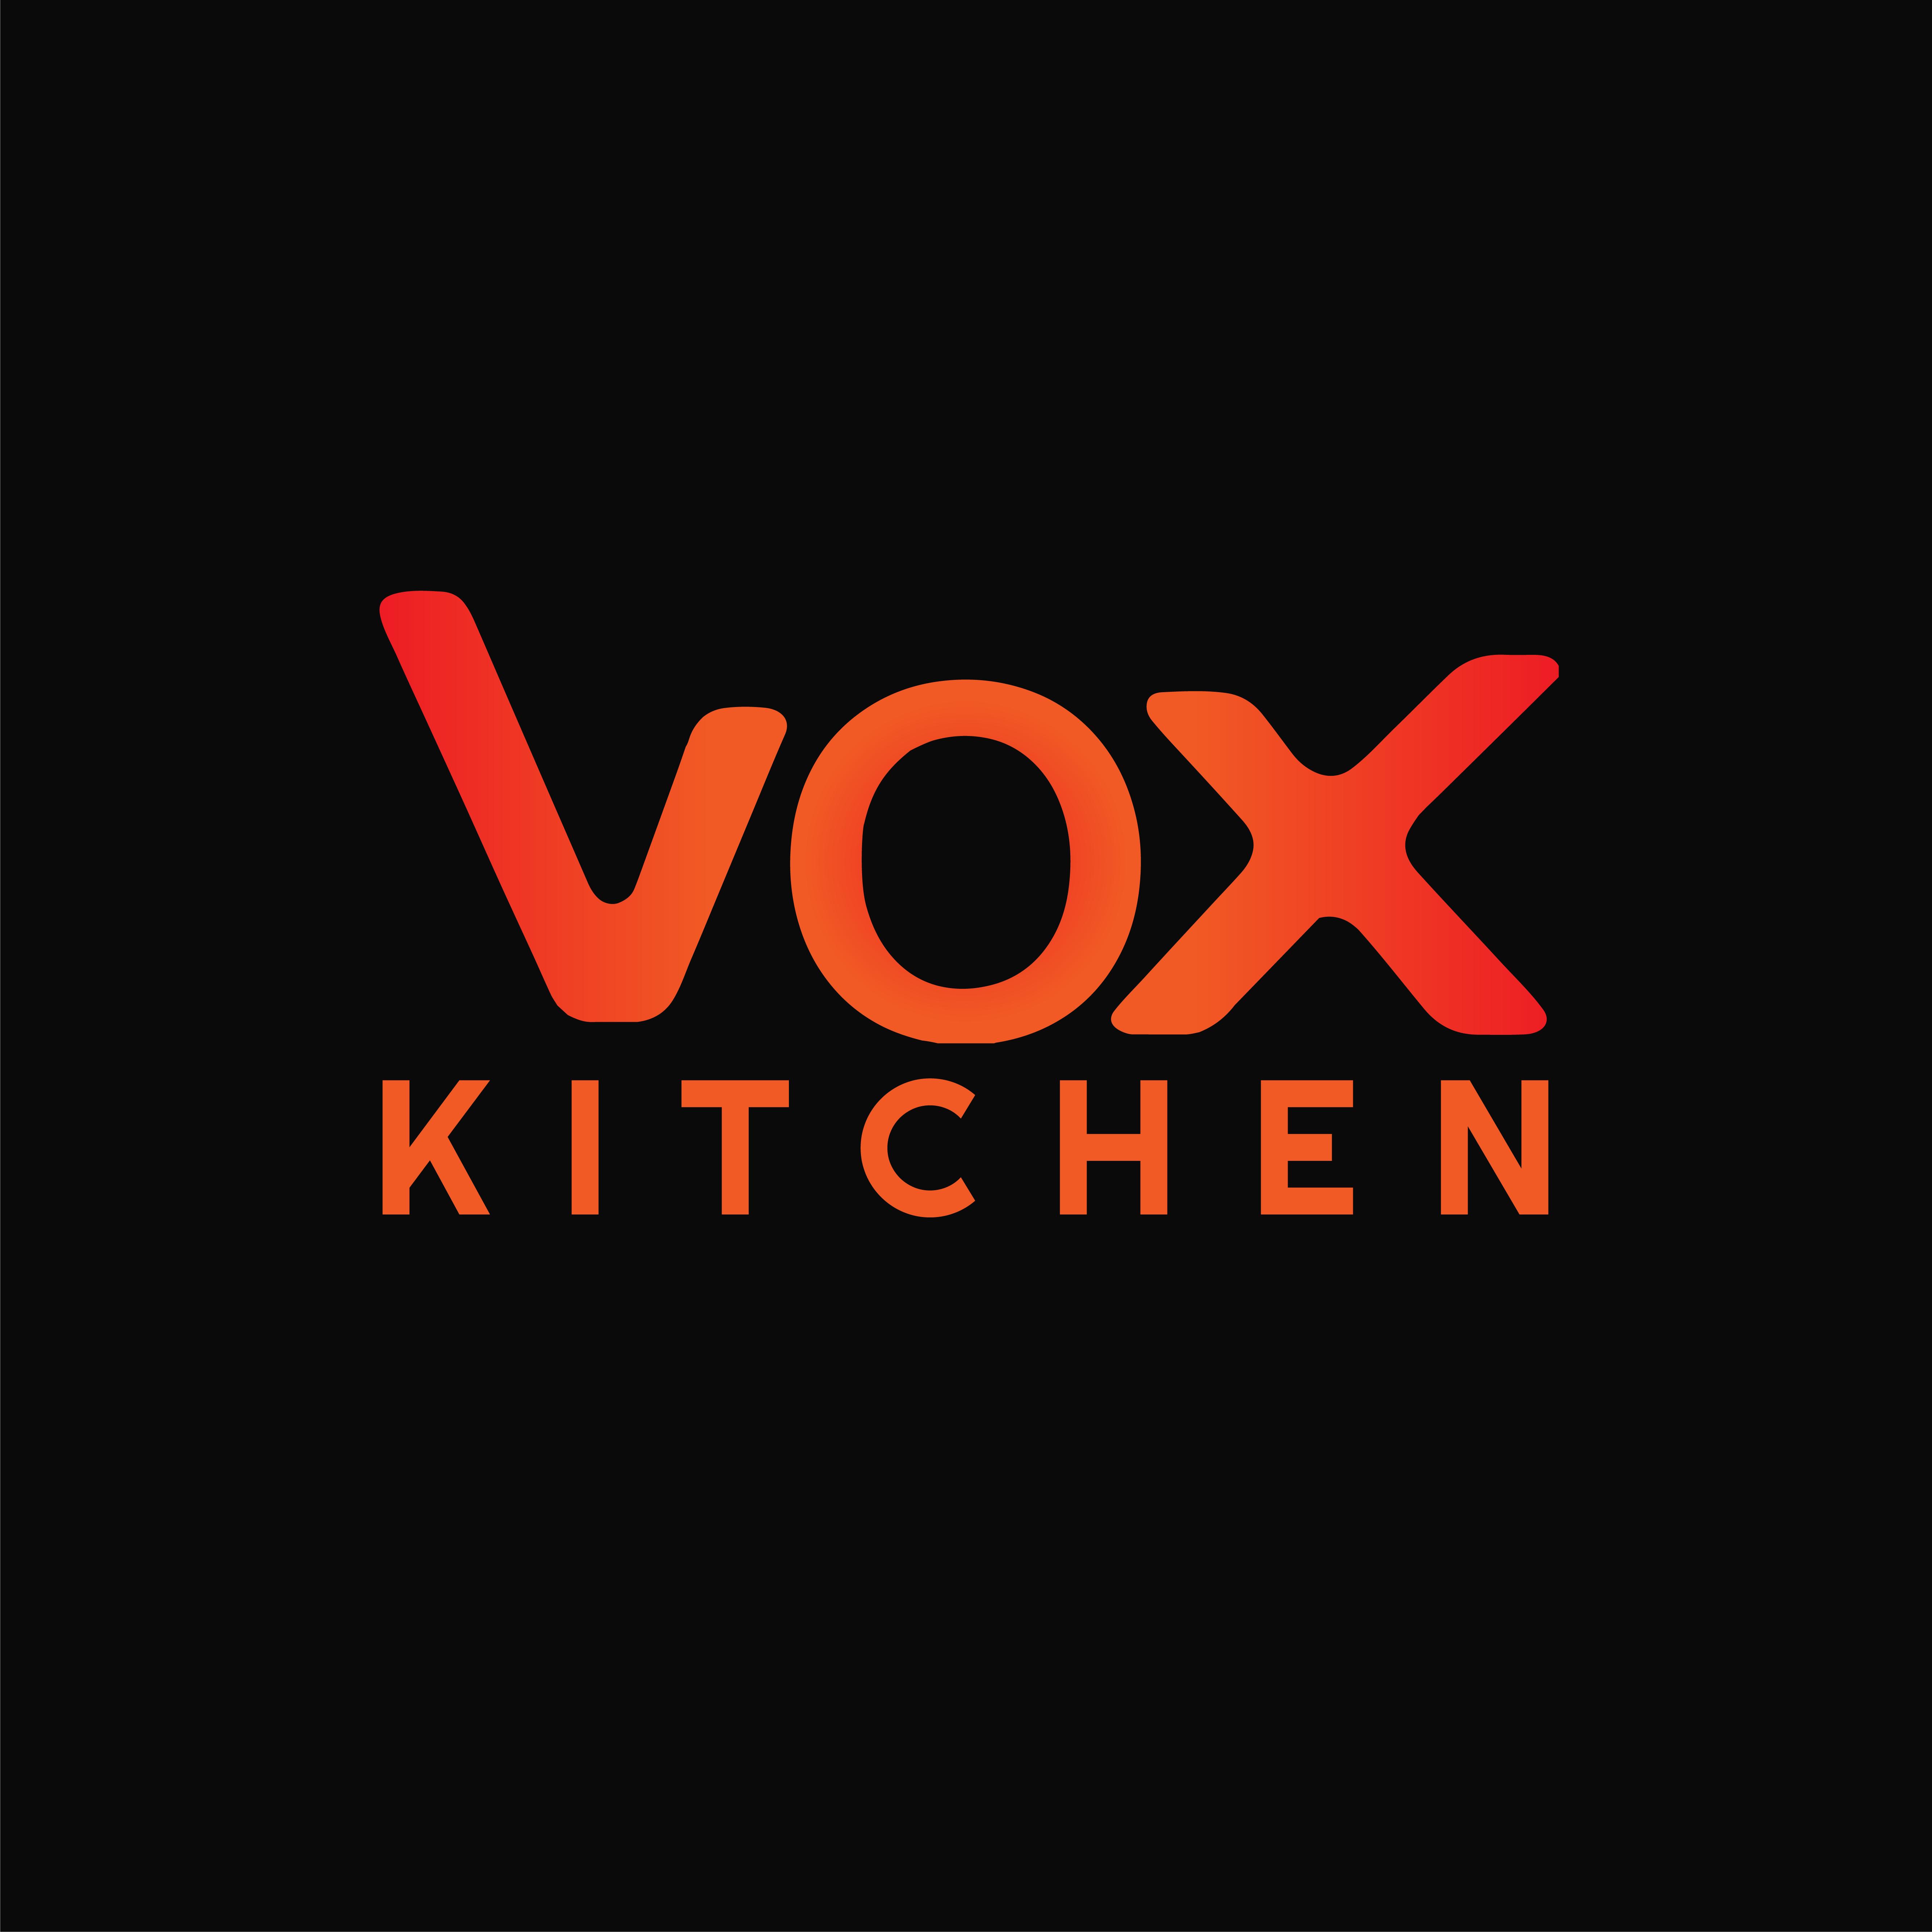 VOX KITCHEN